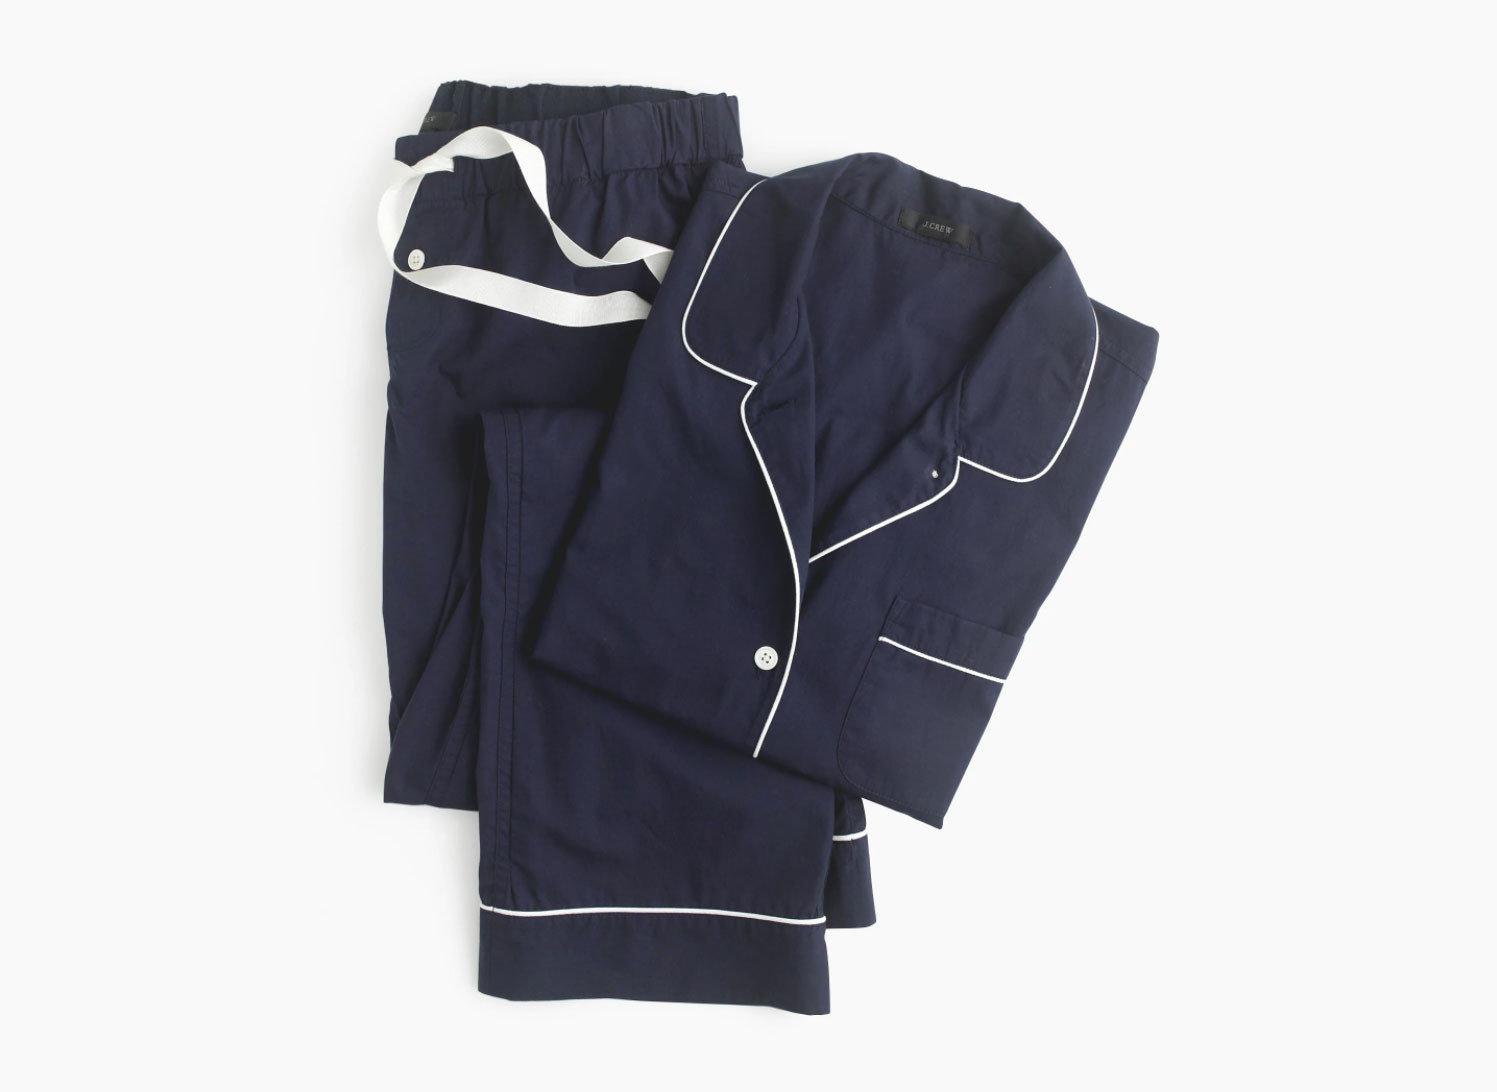 Style + Design Travel Shop clothing black product sleeve outerwear sportswear hood jacket brand